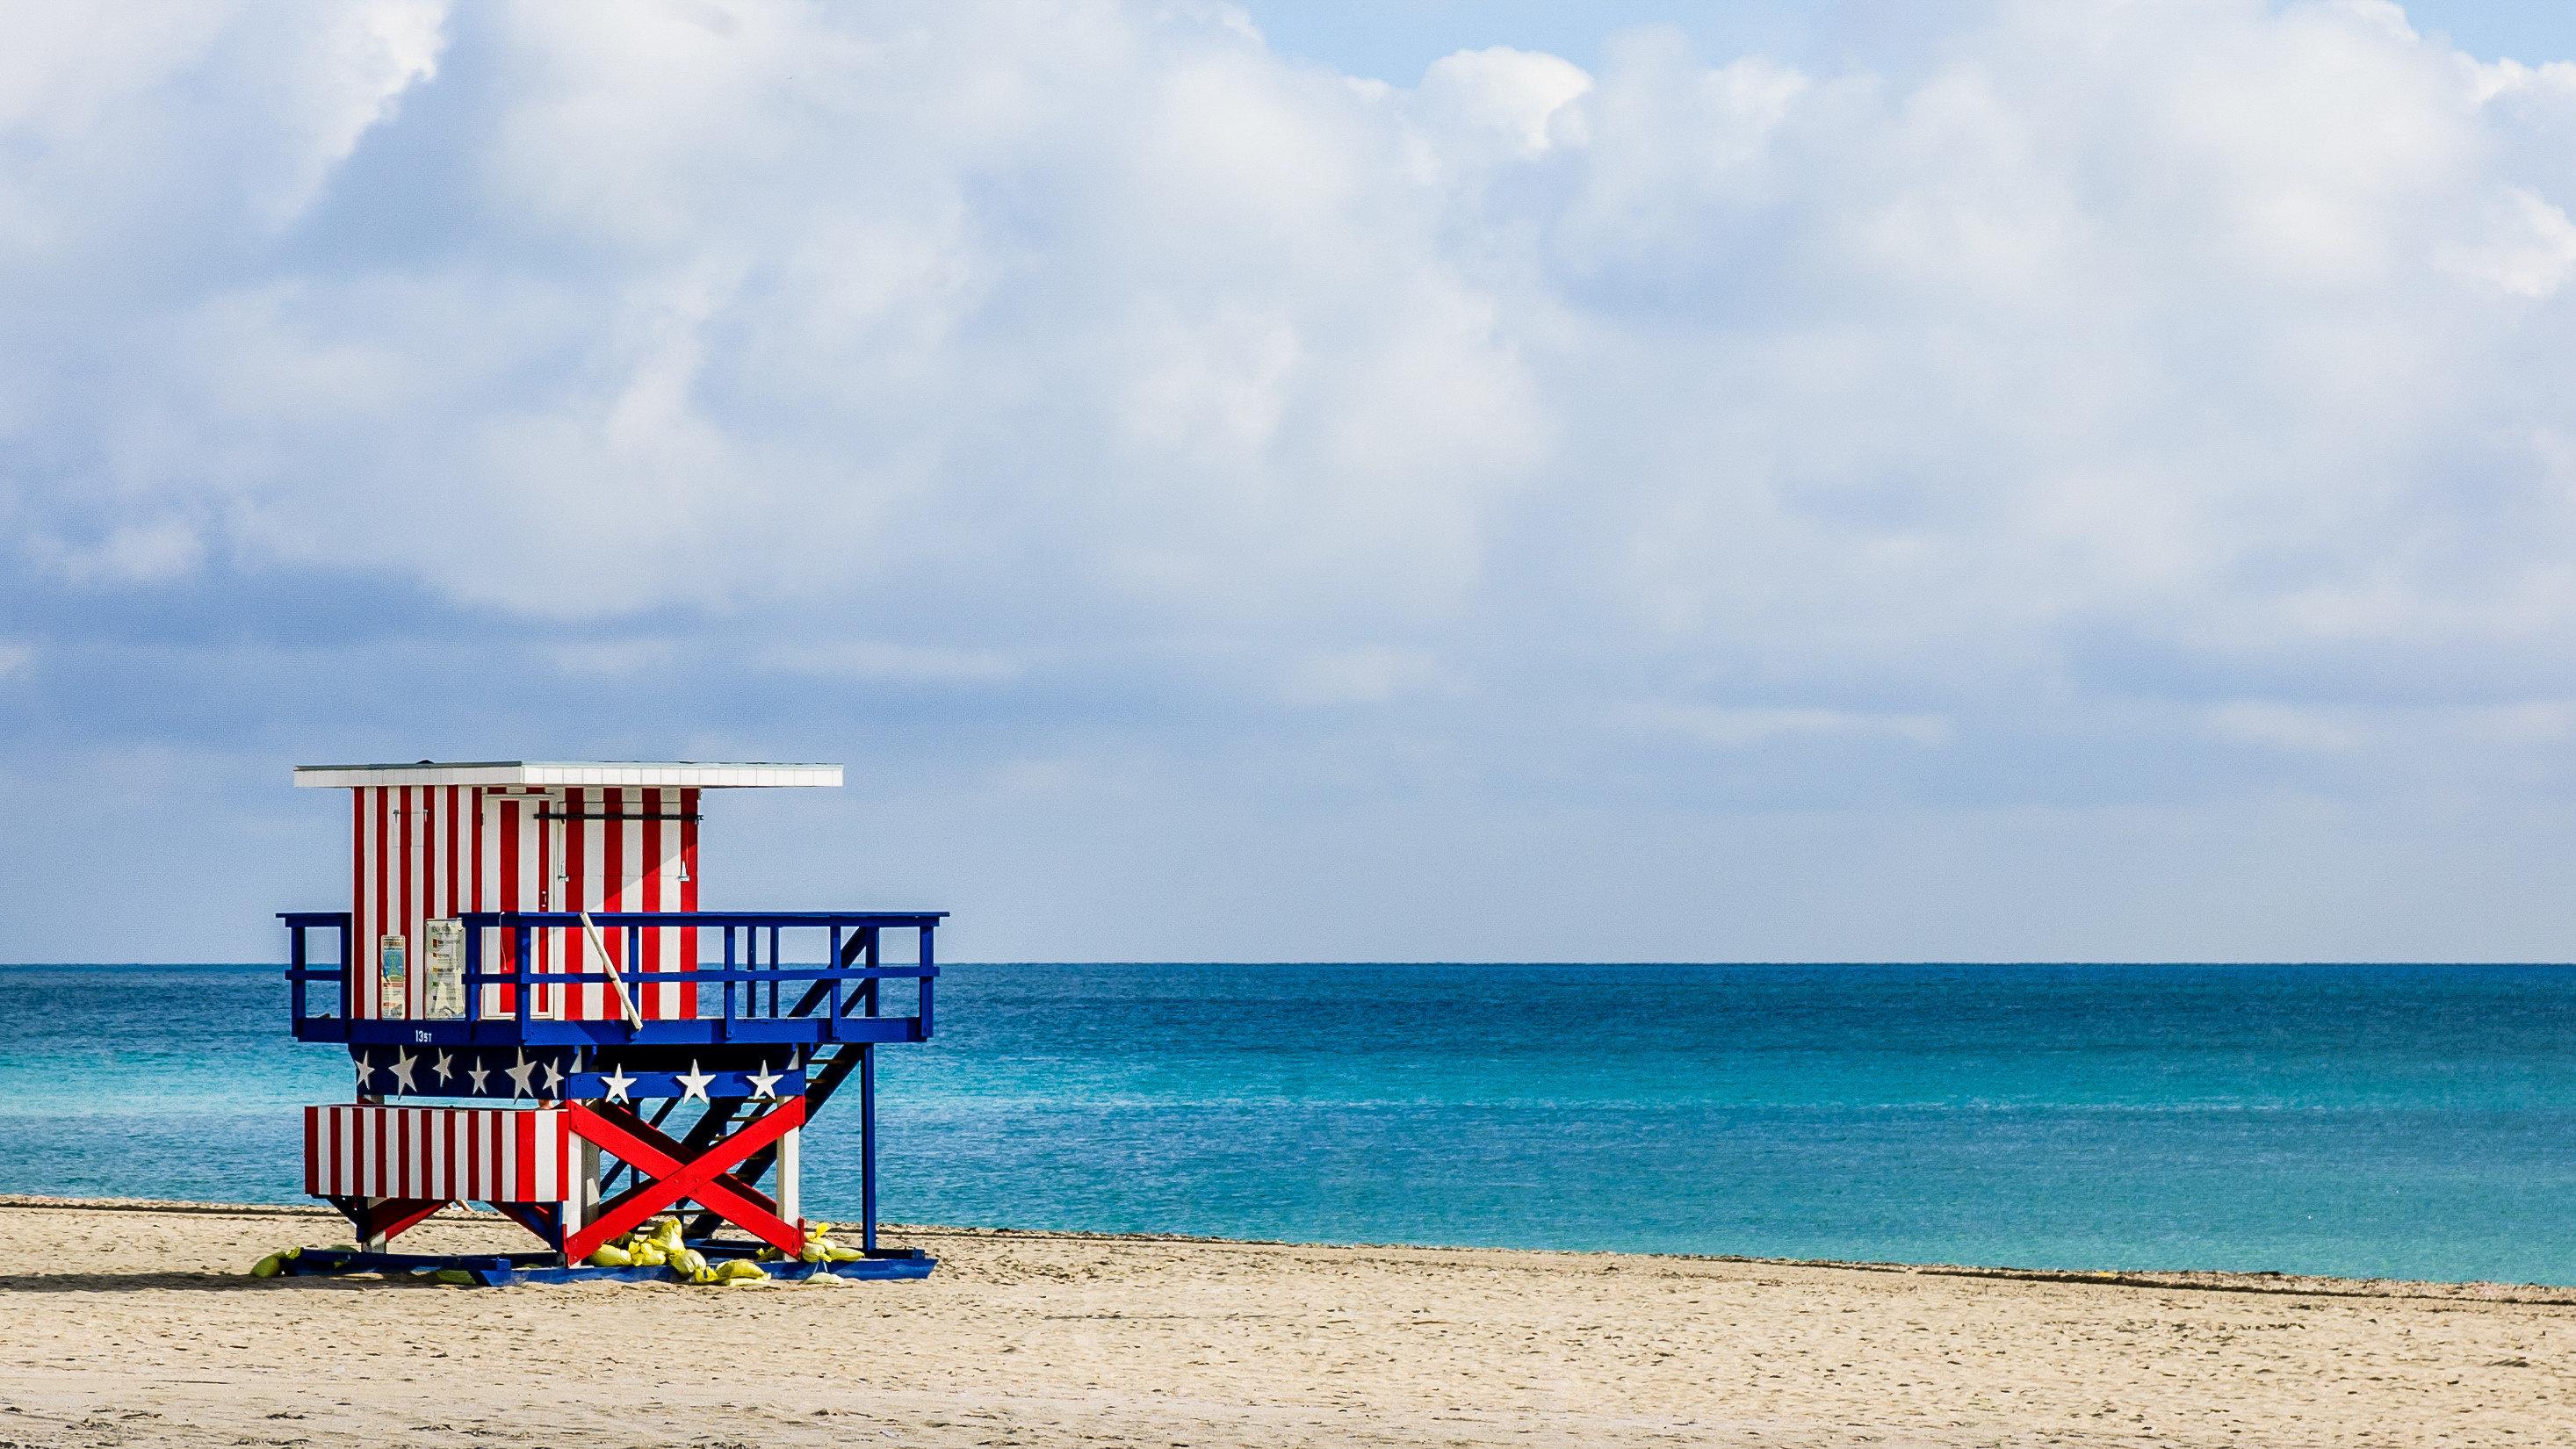 Trip Ideas sky outdoor Beach water Sea shore blue body of water Ocean horizon vacation Coast bay sand pier sandy